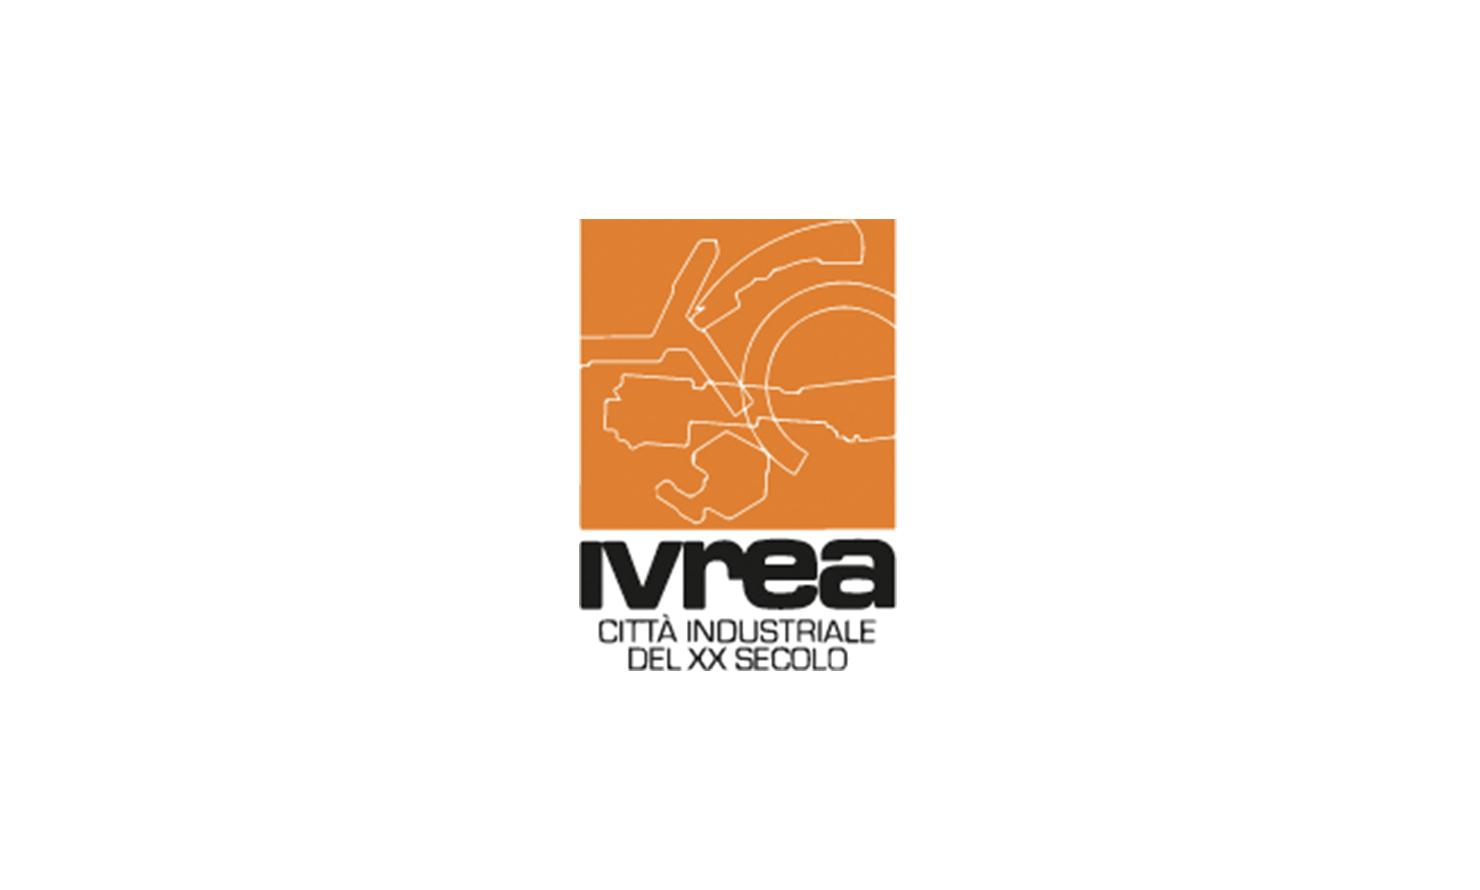 https://www.kubelibre.com/uploads/Slider-work-tutti-clienti/ivrea-e-unesco-città-industriale-del-xx-secolo-logo-2.jpg